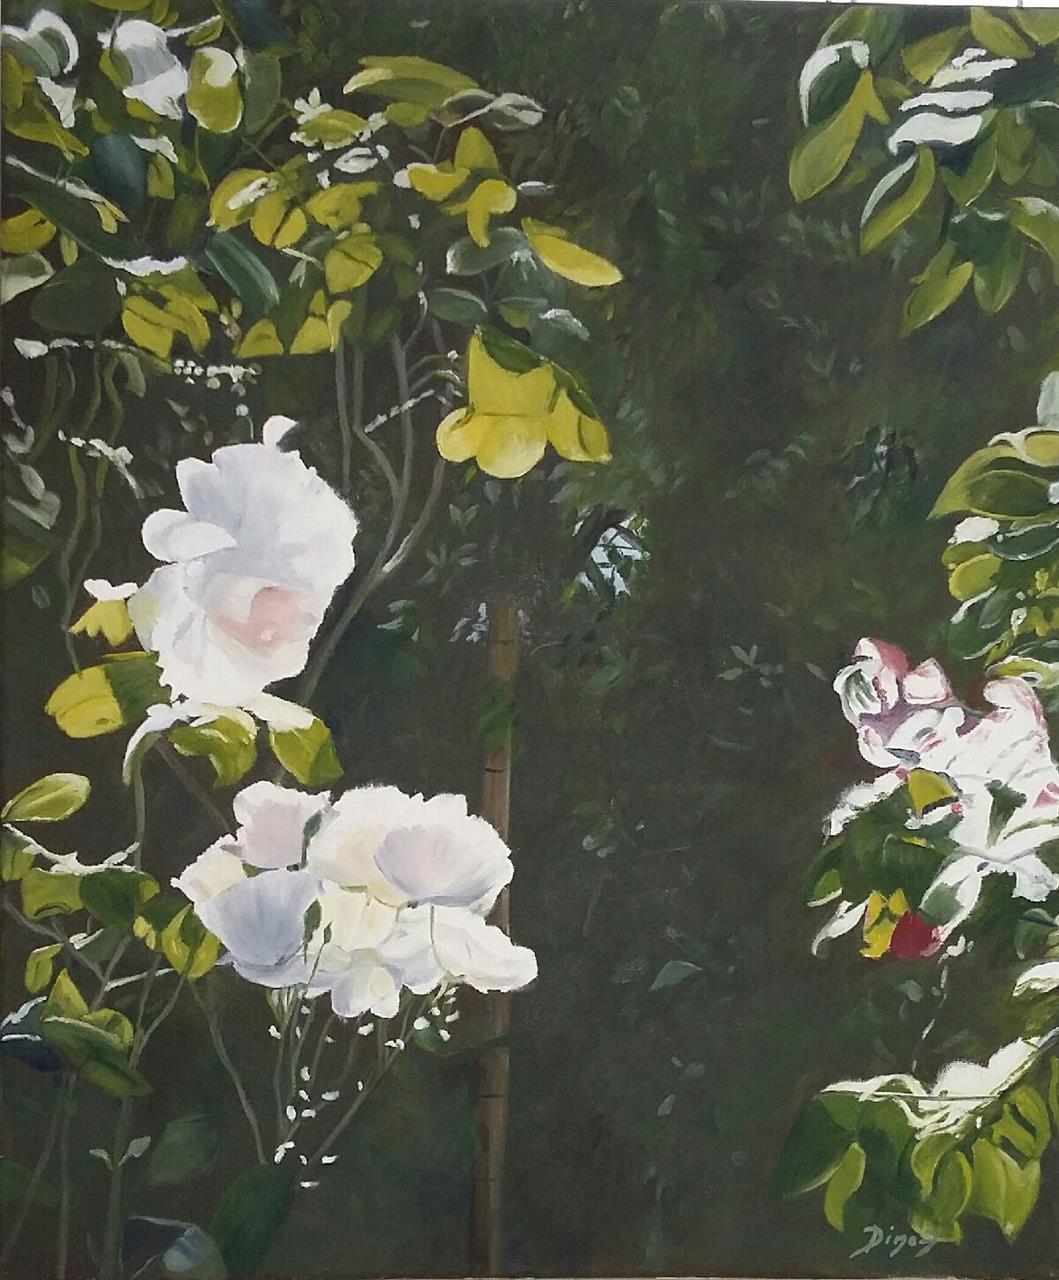 Olja Dina Eriksson